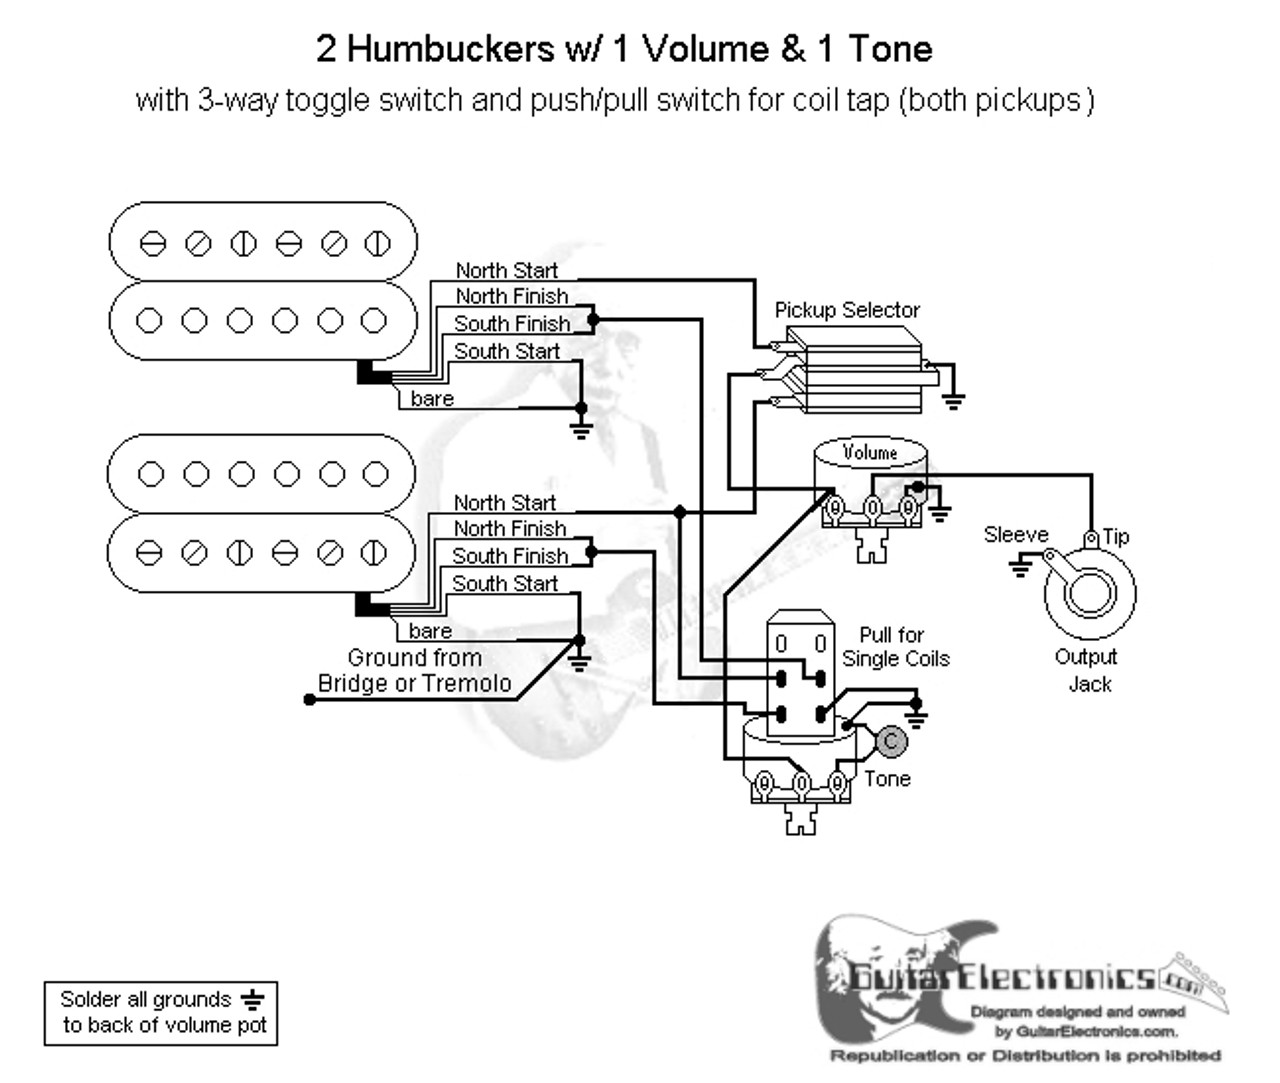 2 Humbuckers3way Toggle Switch1 Volume1 Tonecoil Taprhguitarelectronics: Les Paul Split Coil Wiring Diagram At Gmaili.net